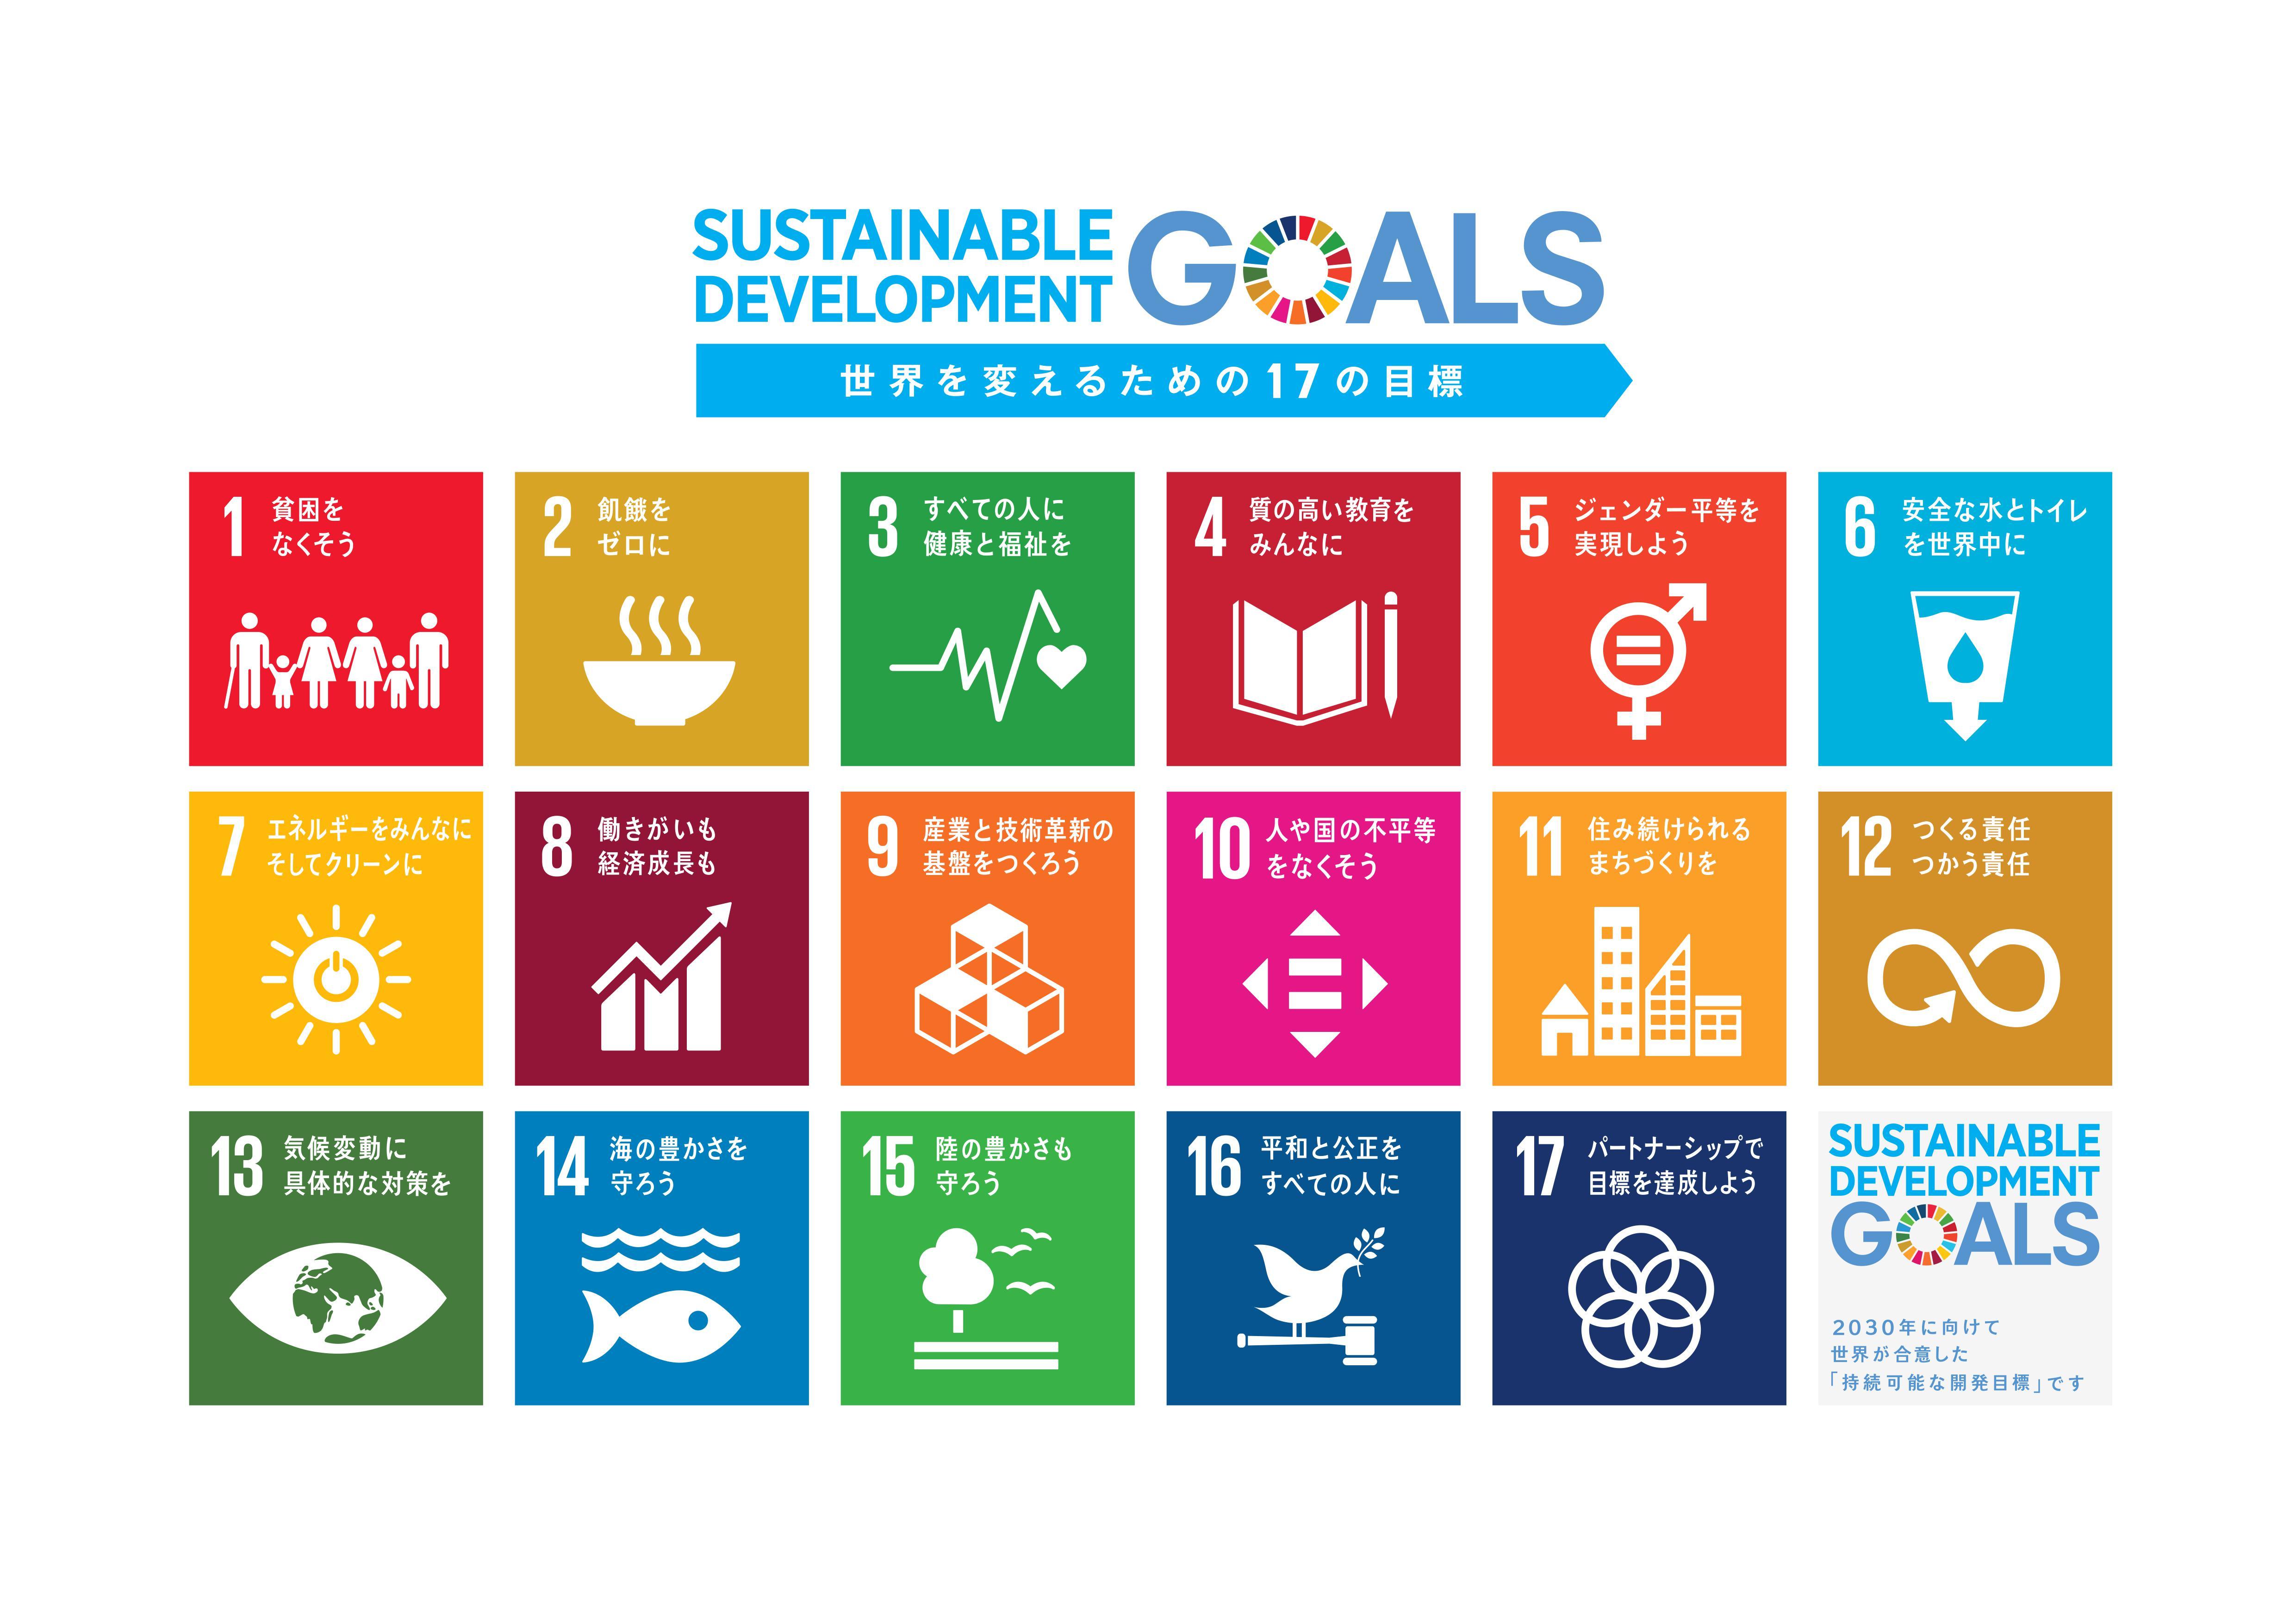 持続 可能 な 開発 目標 持続可能な開発目標 - Wikipedia